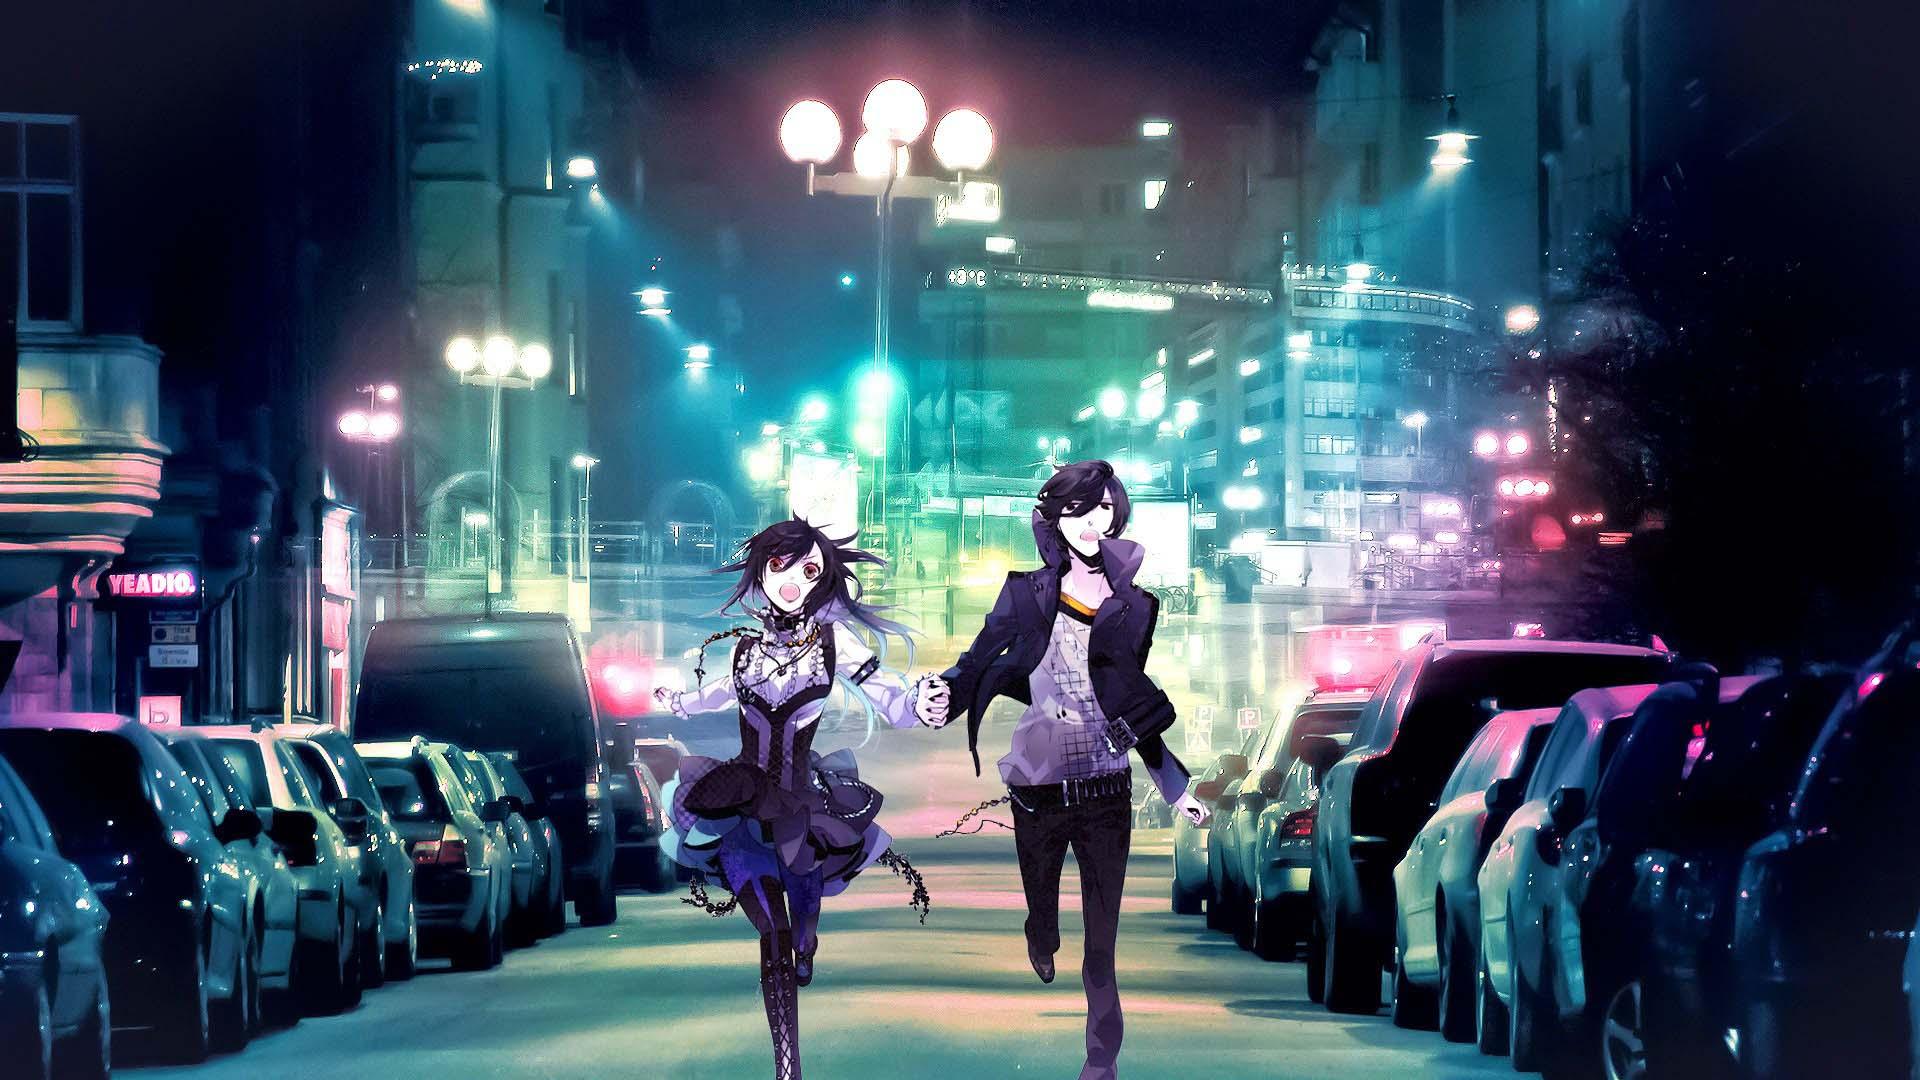 Awesome Anime Wallpaper - WallpaperSafari